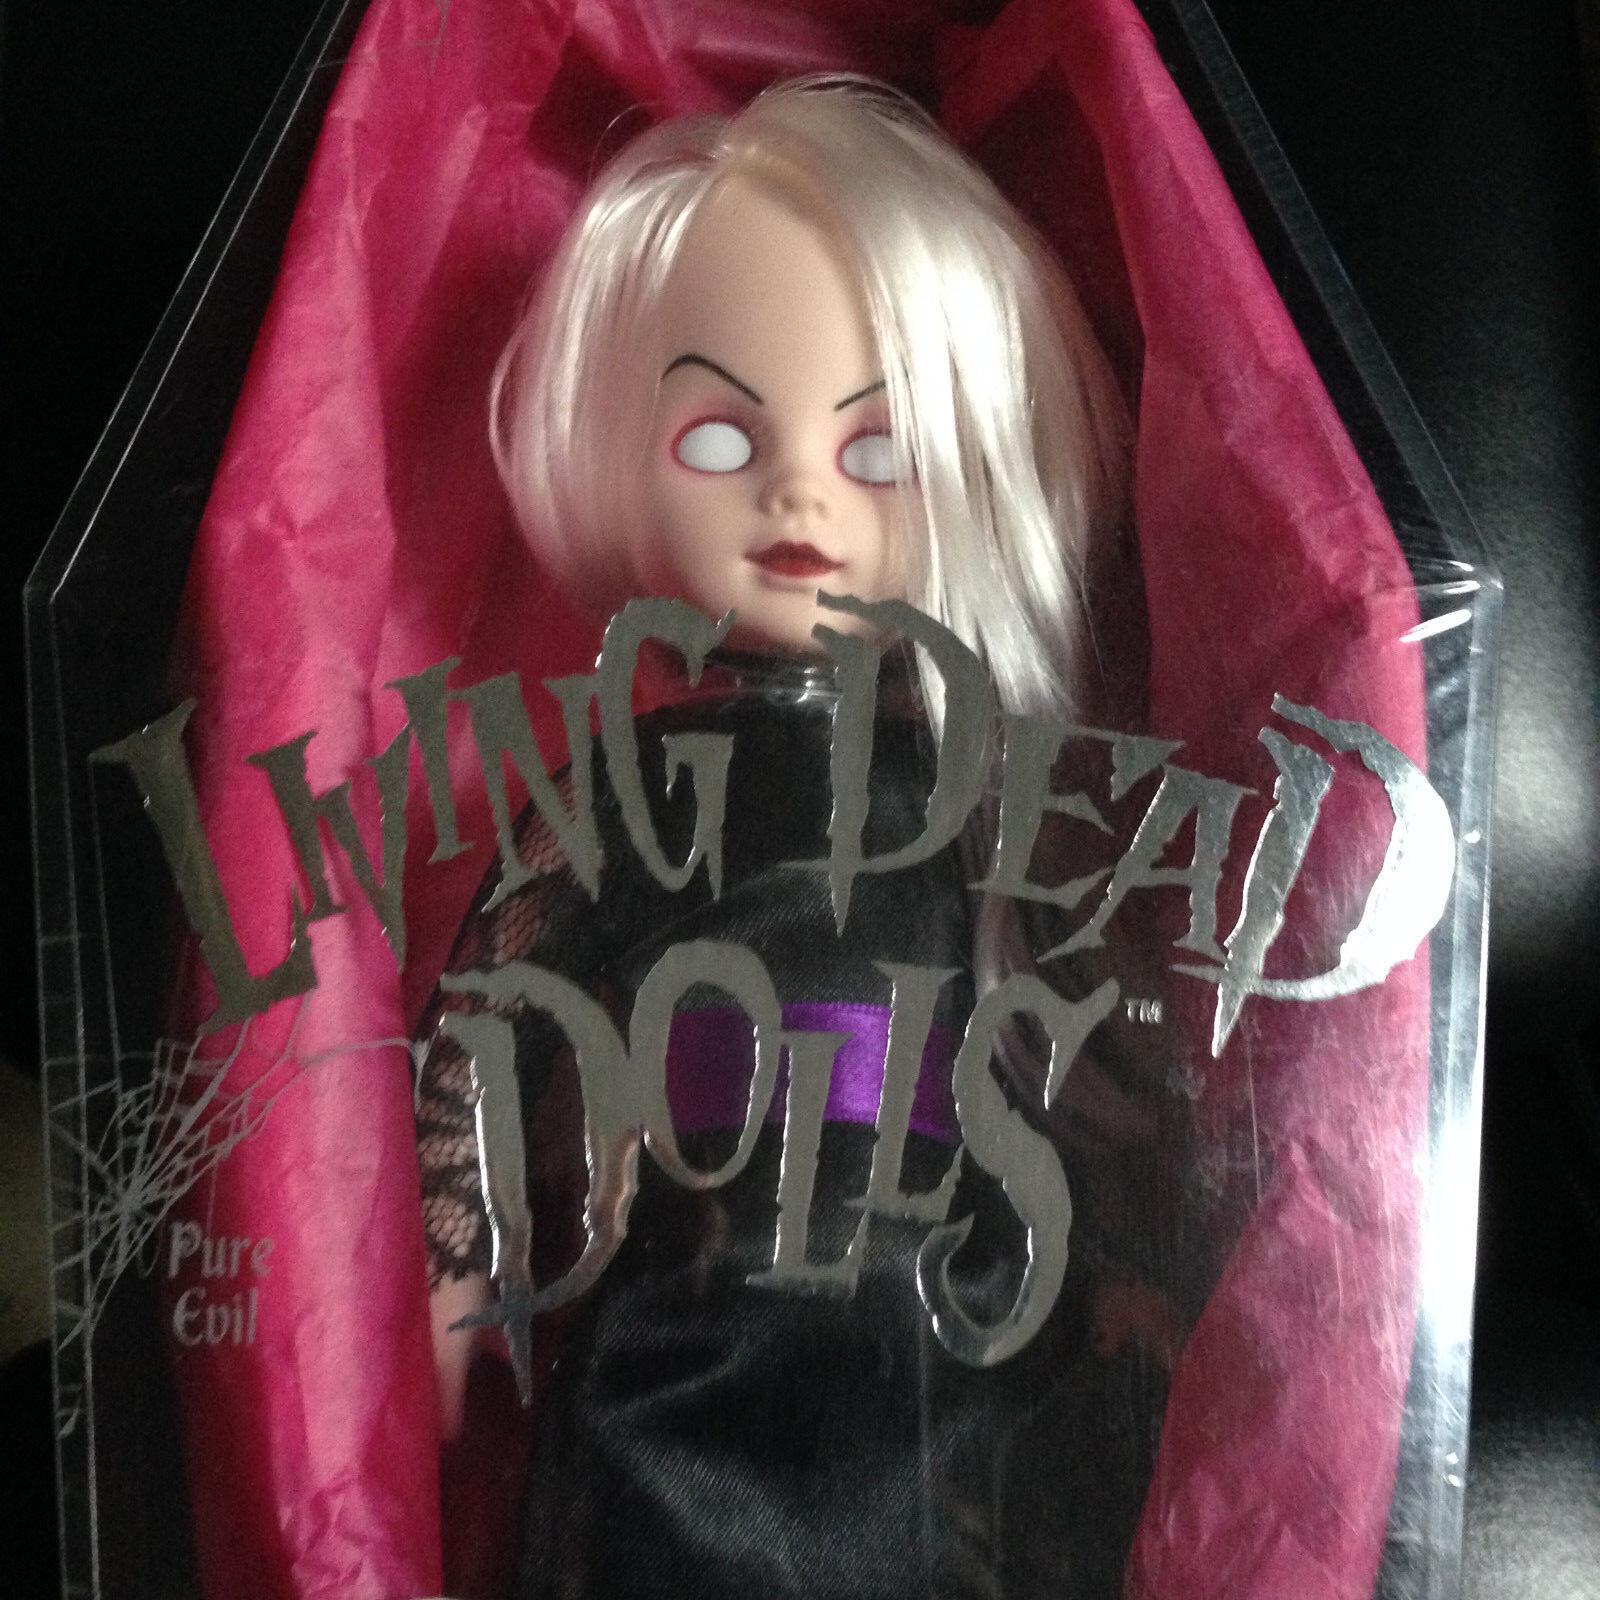 LIVING DEAD DOLLS Ms. Eerie Eerie Eerie SERIES 4 RARE- SEALED NEW (NUOVO) 268382